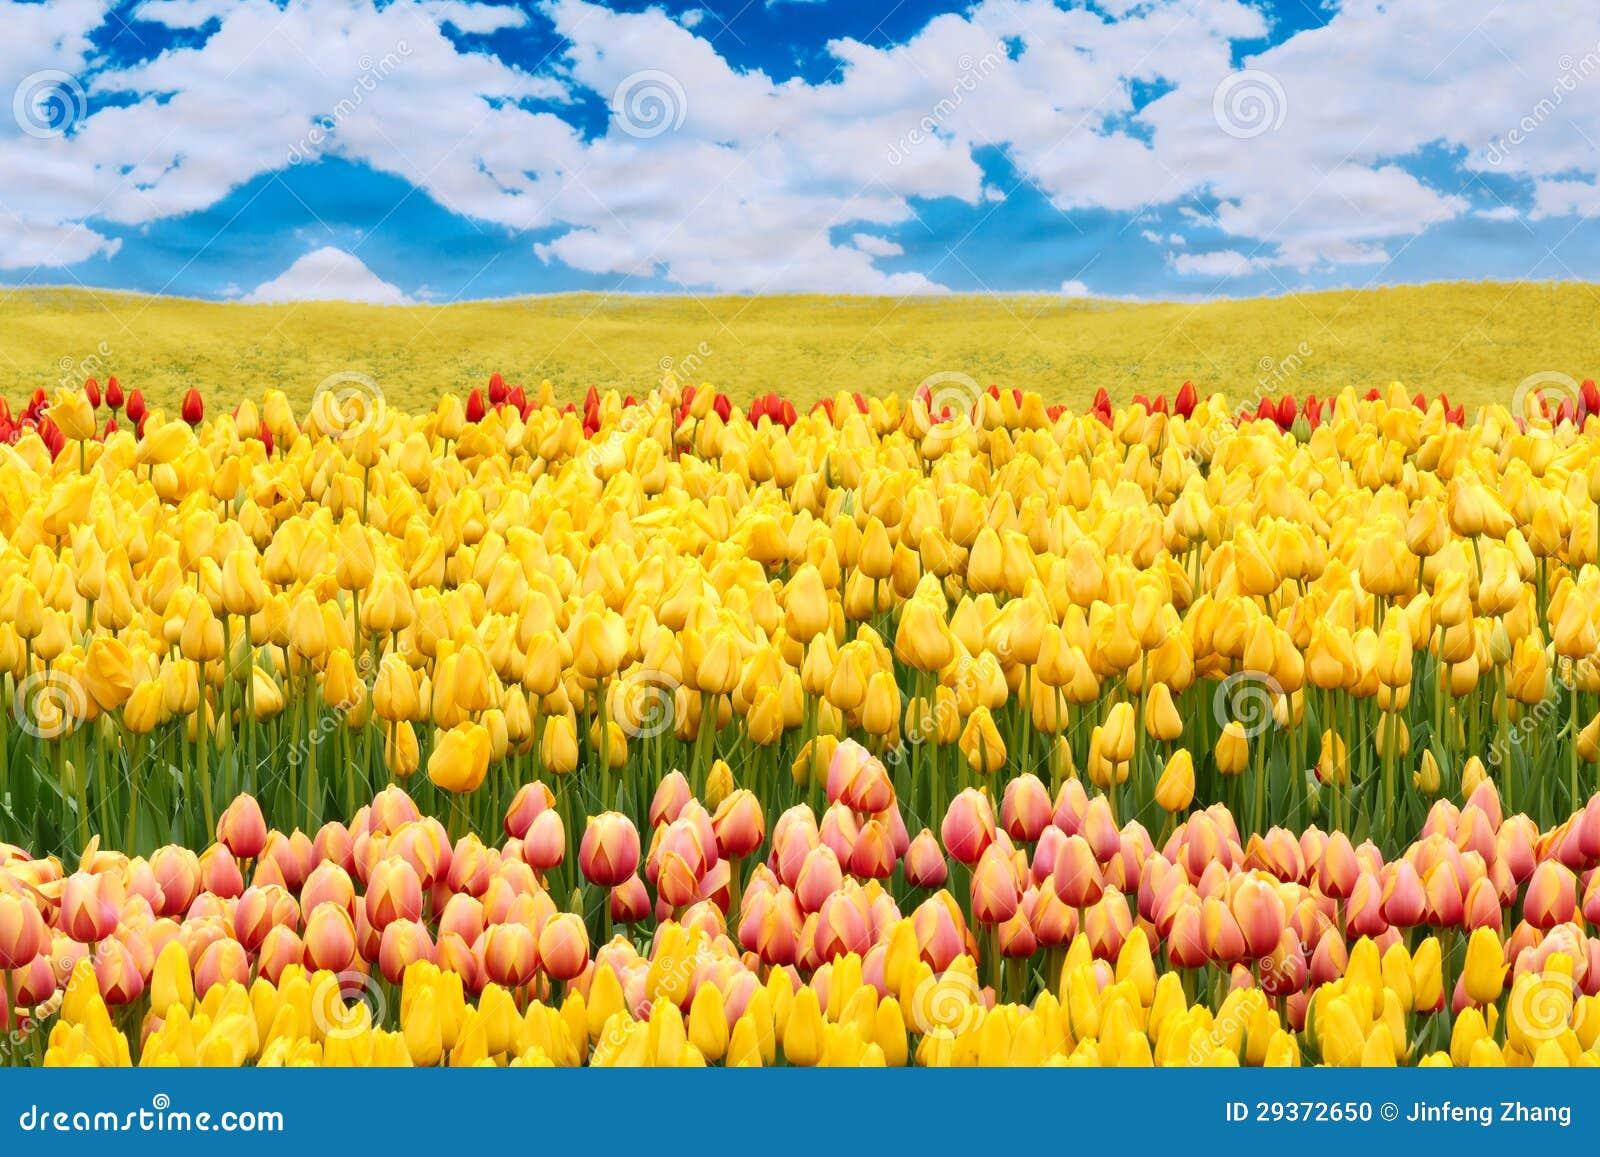 flower scenery stock photo image of cloud white yellow 29372650